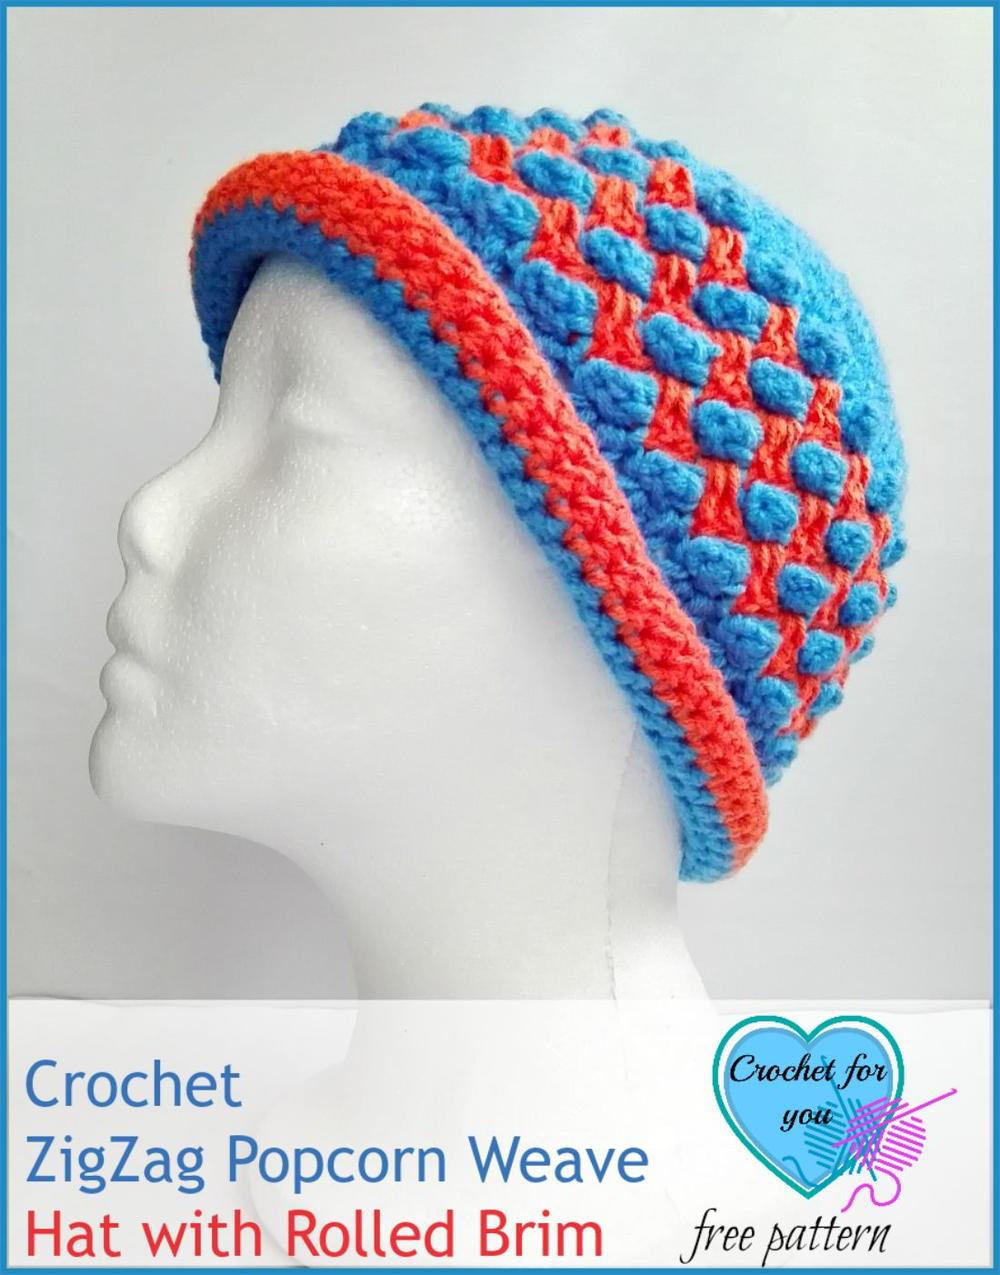 Free Crochet Zig Zag Hat Pattern : Zig Zag Popcorn Weave Crochet Hat Pattern FaveCrafts.com